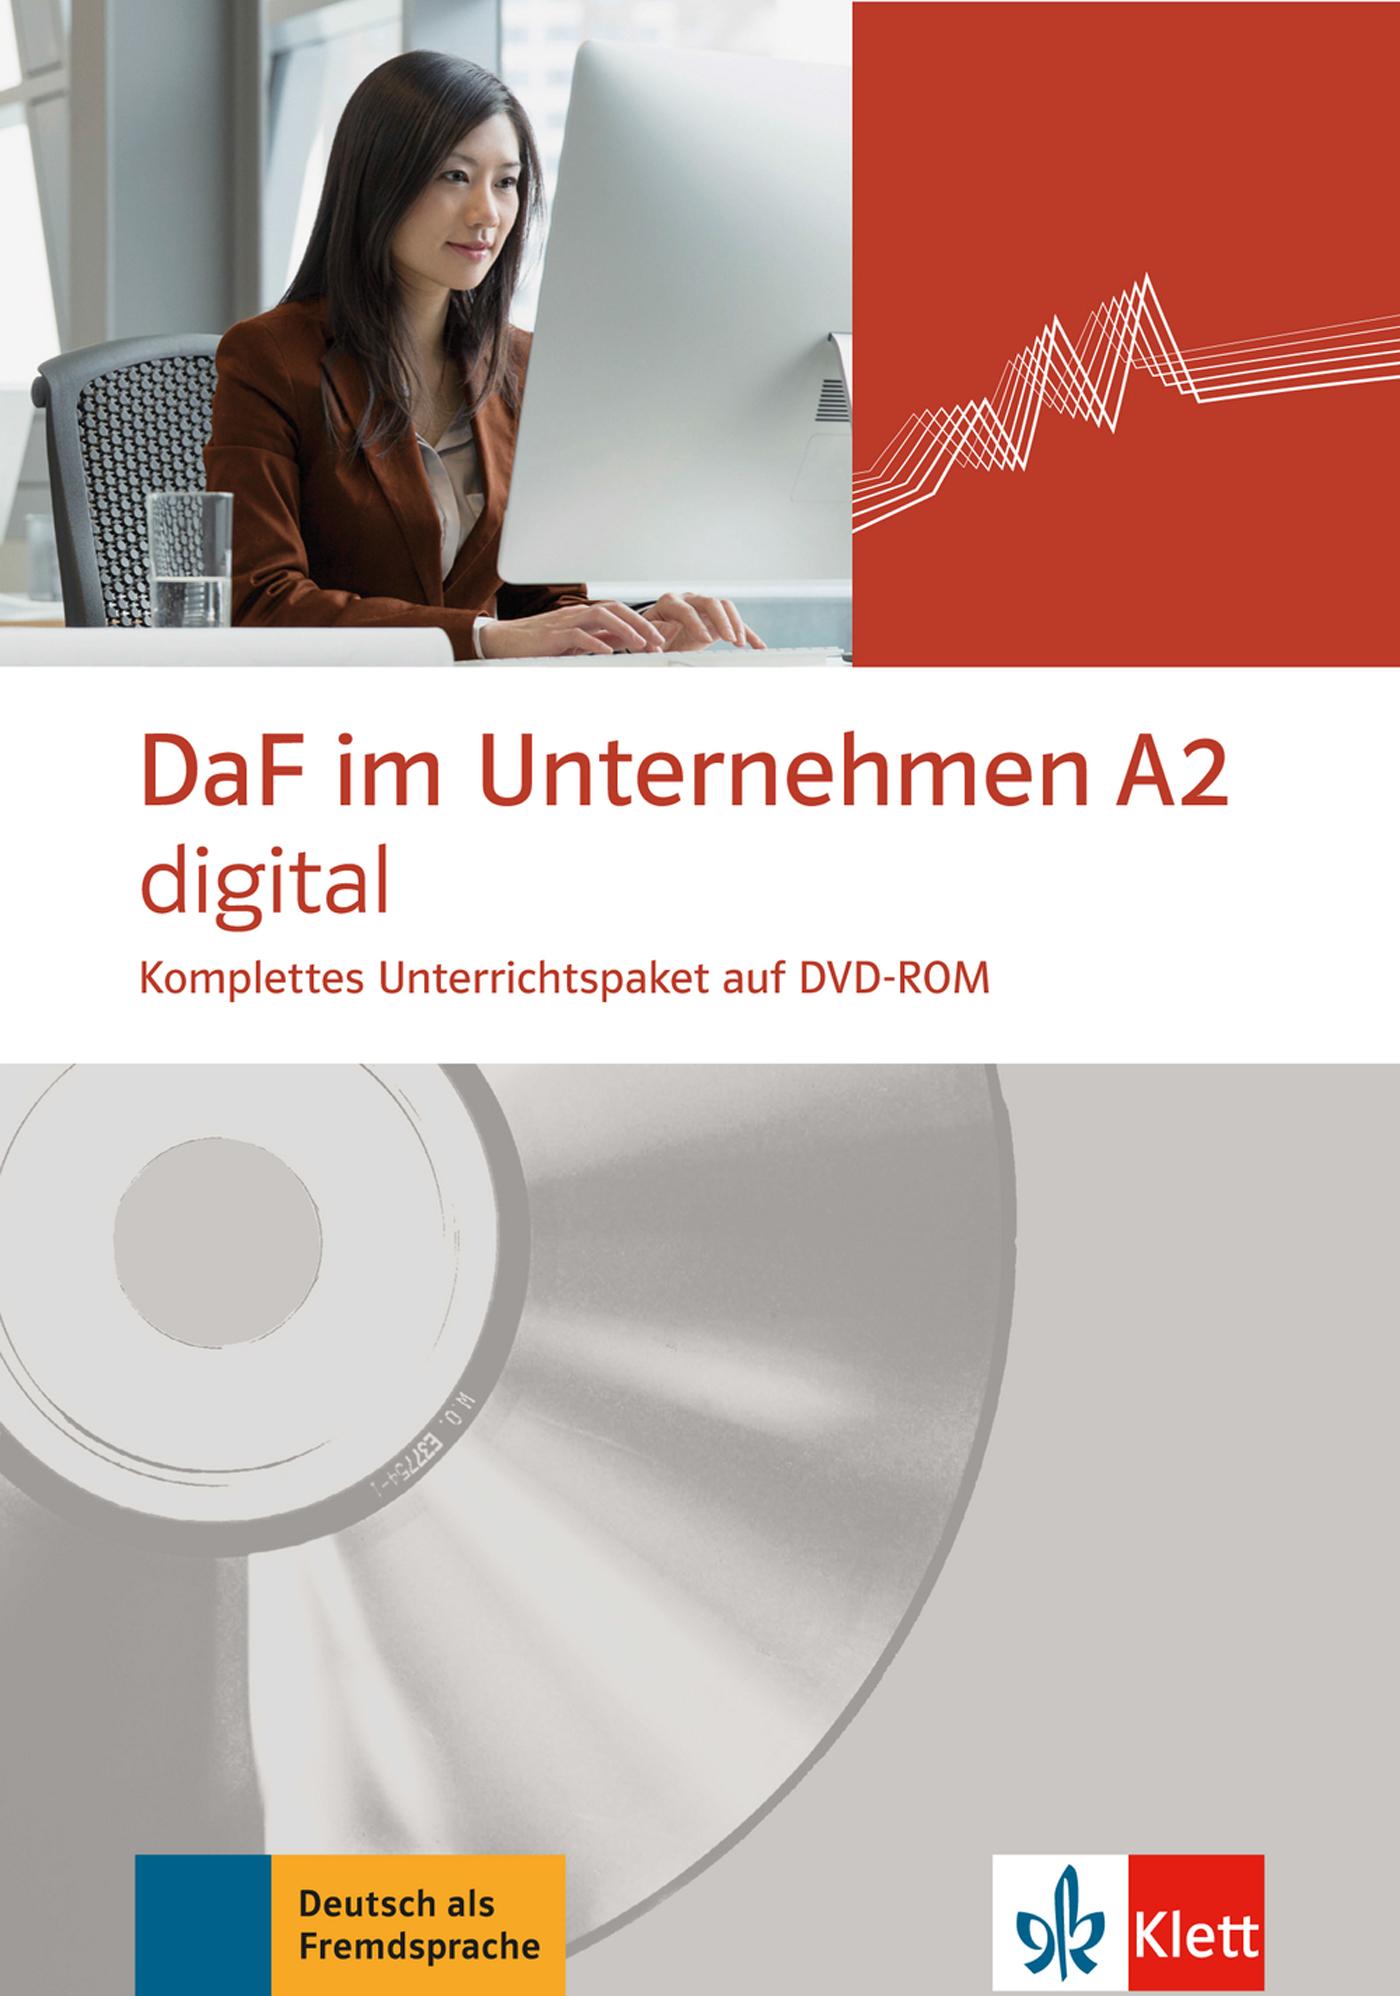 DAF IM UNTERNEHMEN A2 - DVD MANUEL NUMERIQUE